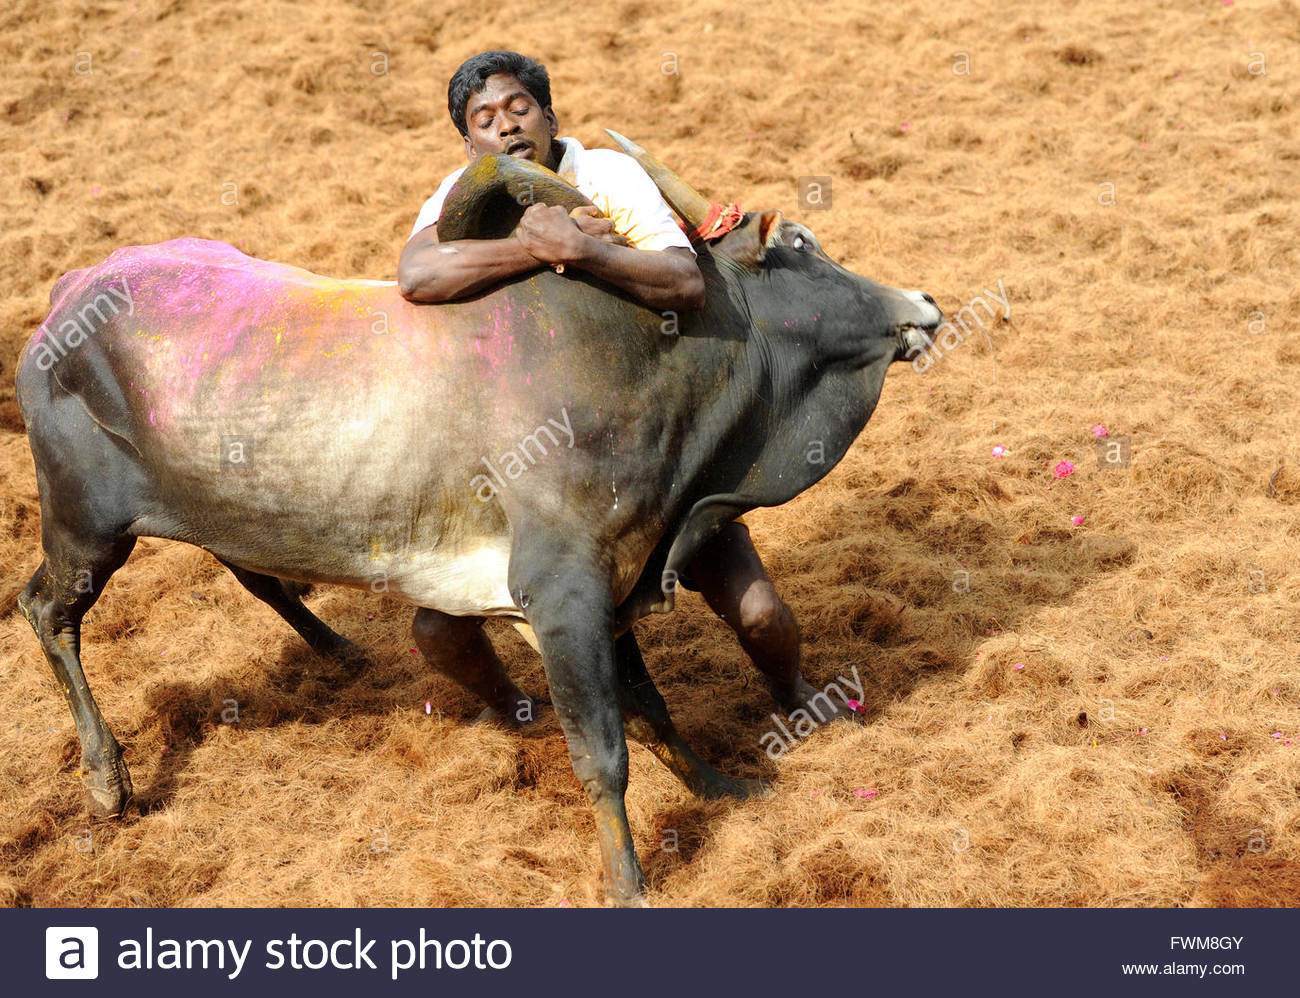 Indian Bull Fight, Jallikattu /taming the bull happens during pongal (harvest festival) celebrations in Tamilnadu, - Stock Image